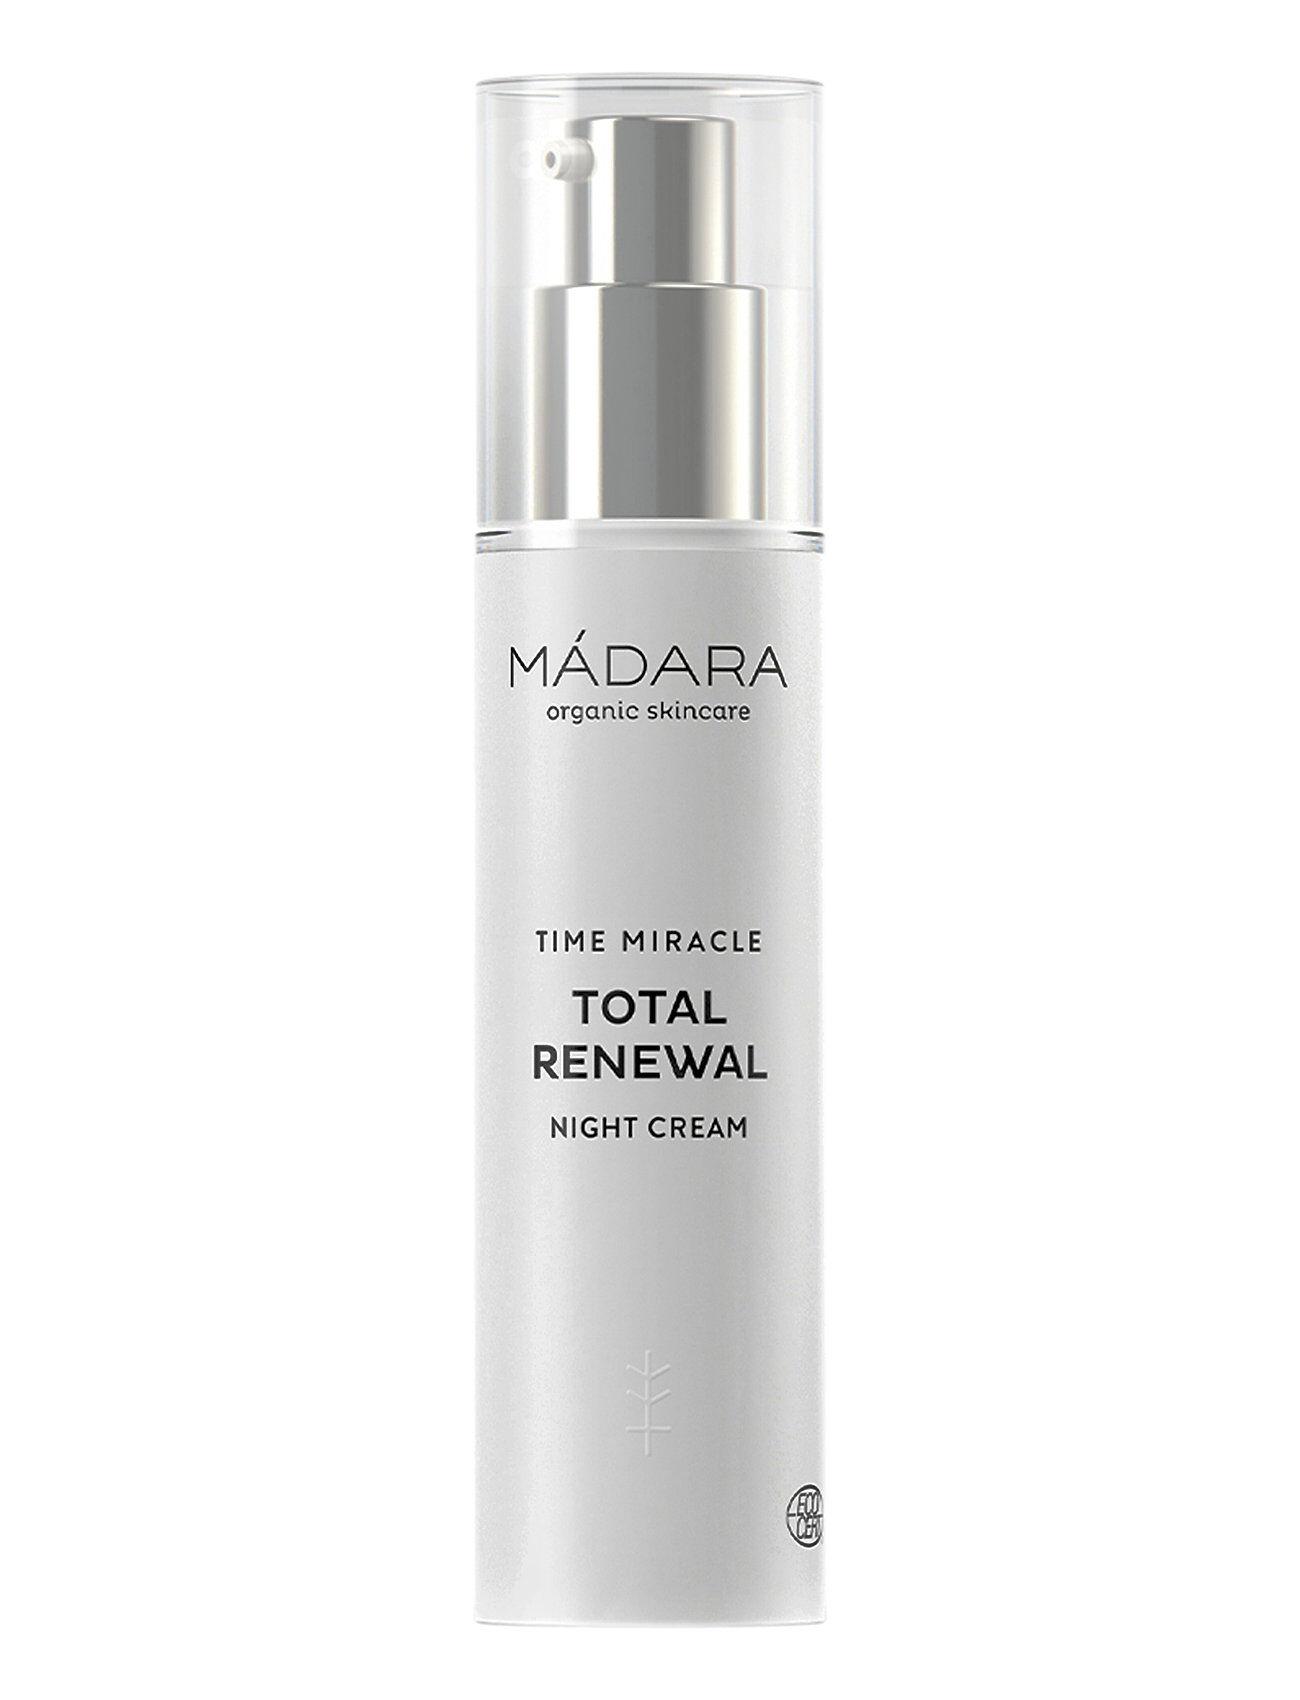 MÁDARA Total Renewal Night Cream, 50 Ml